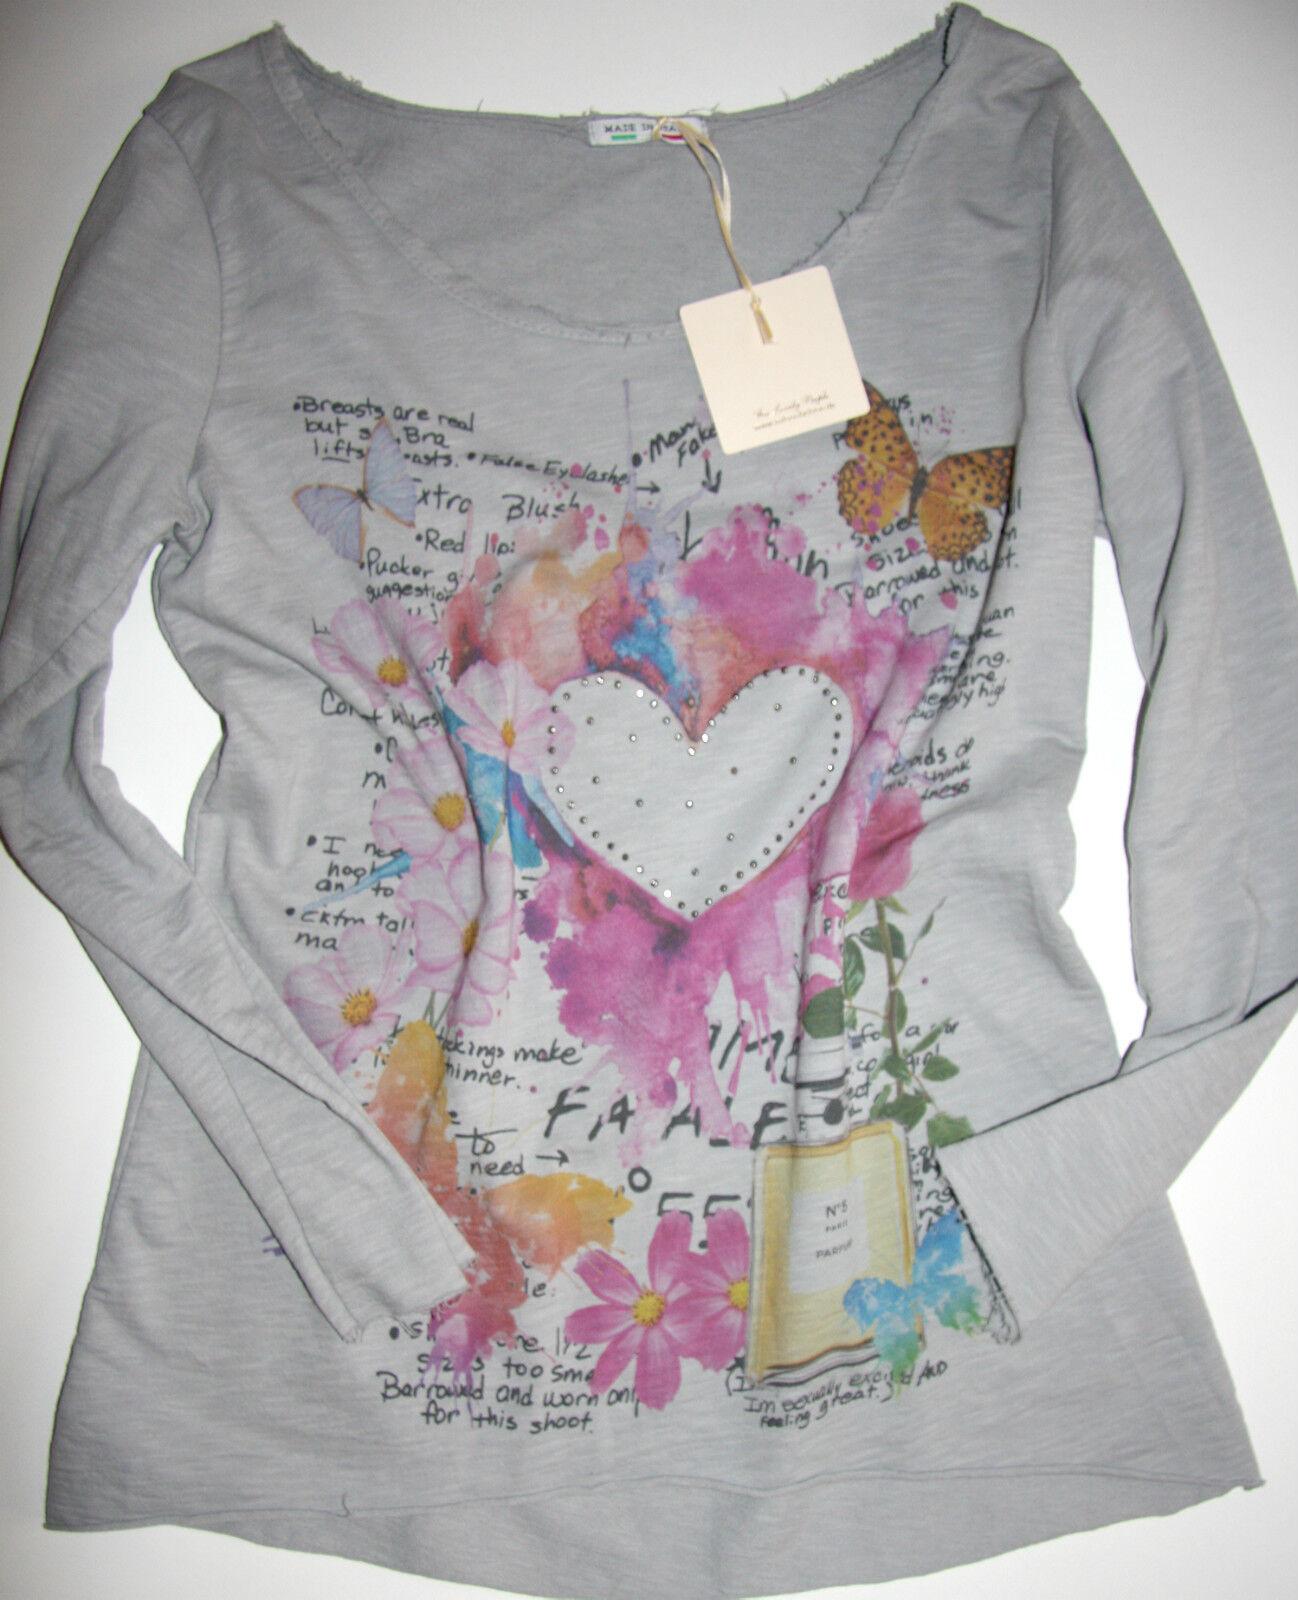 V Milano  go for style Langarm-Shirt   Hearts  Grey  Offnähte size 38-40 Neu